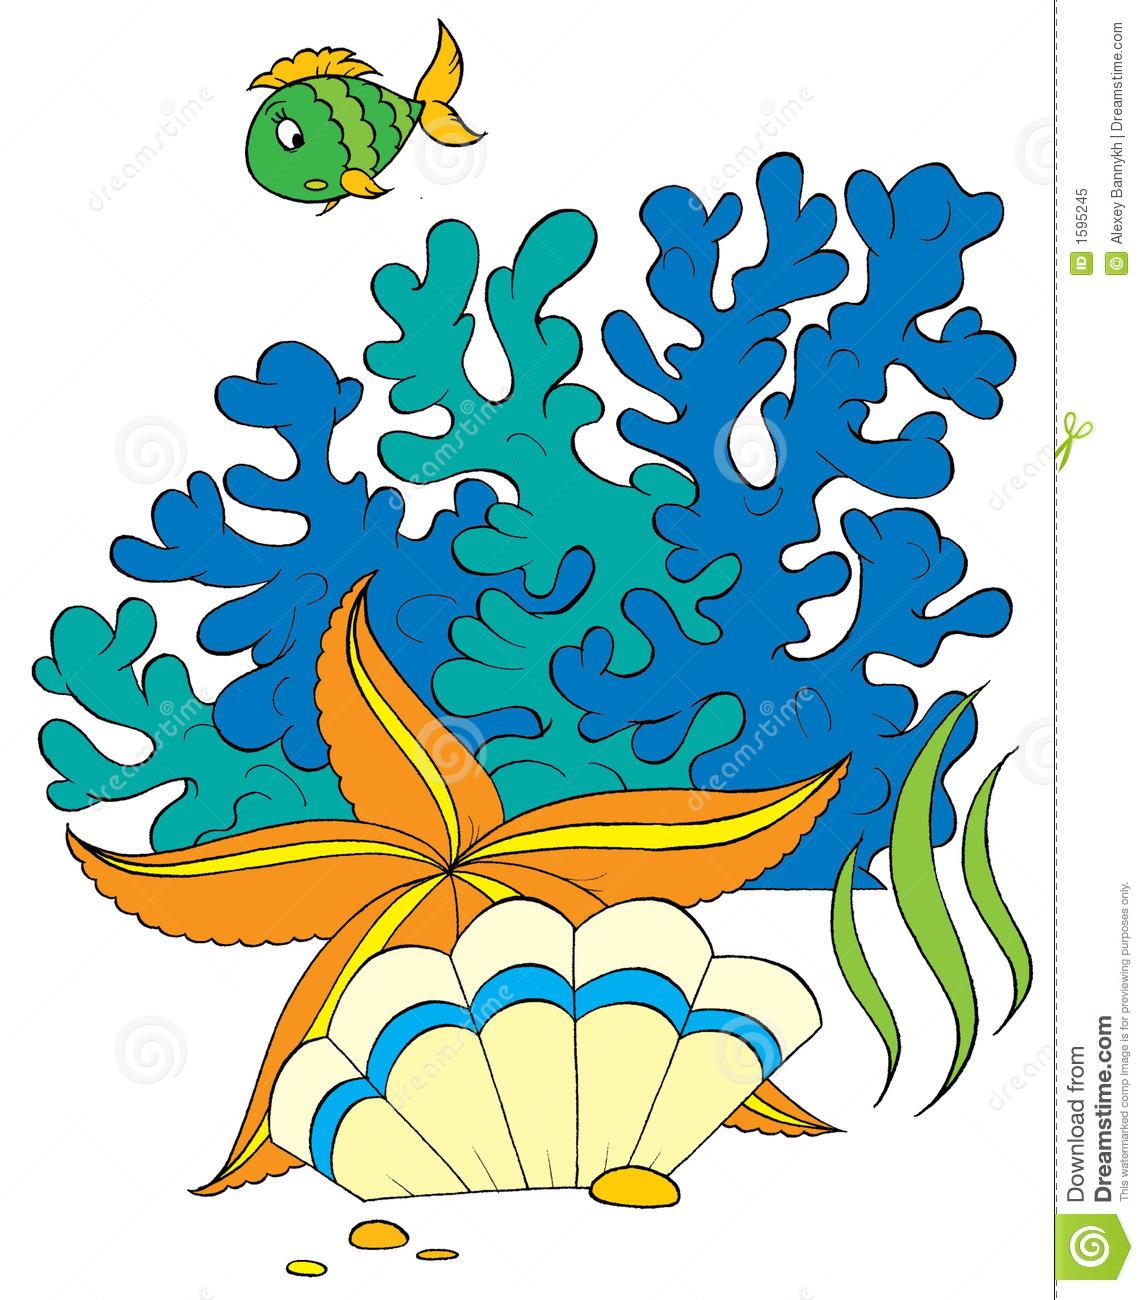 1144x1300 Seaweed Clipart Clipart Panda